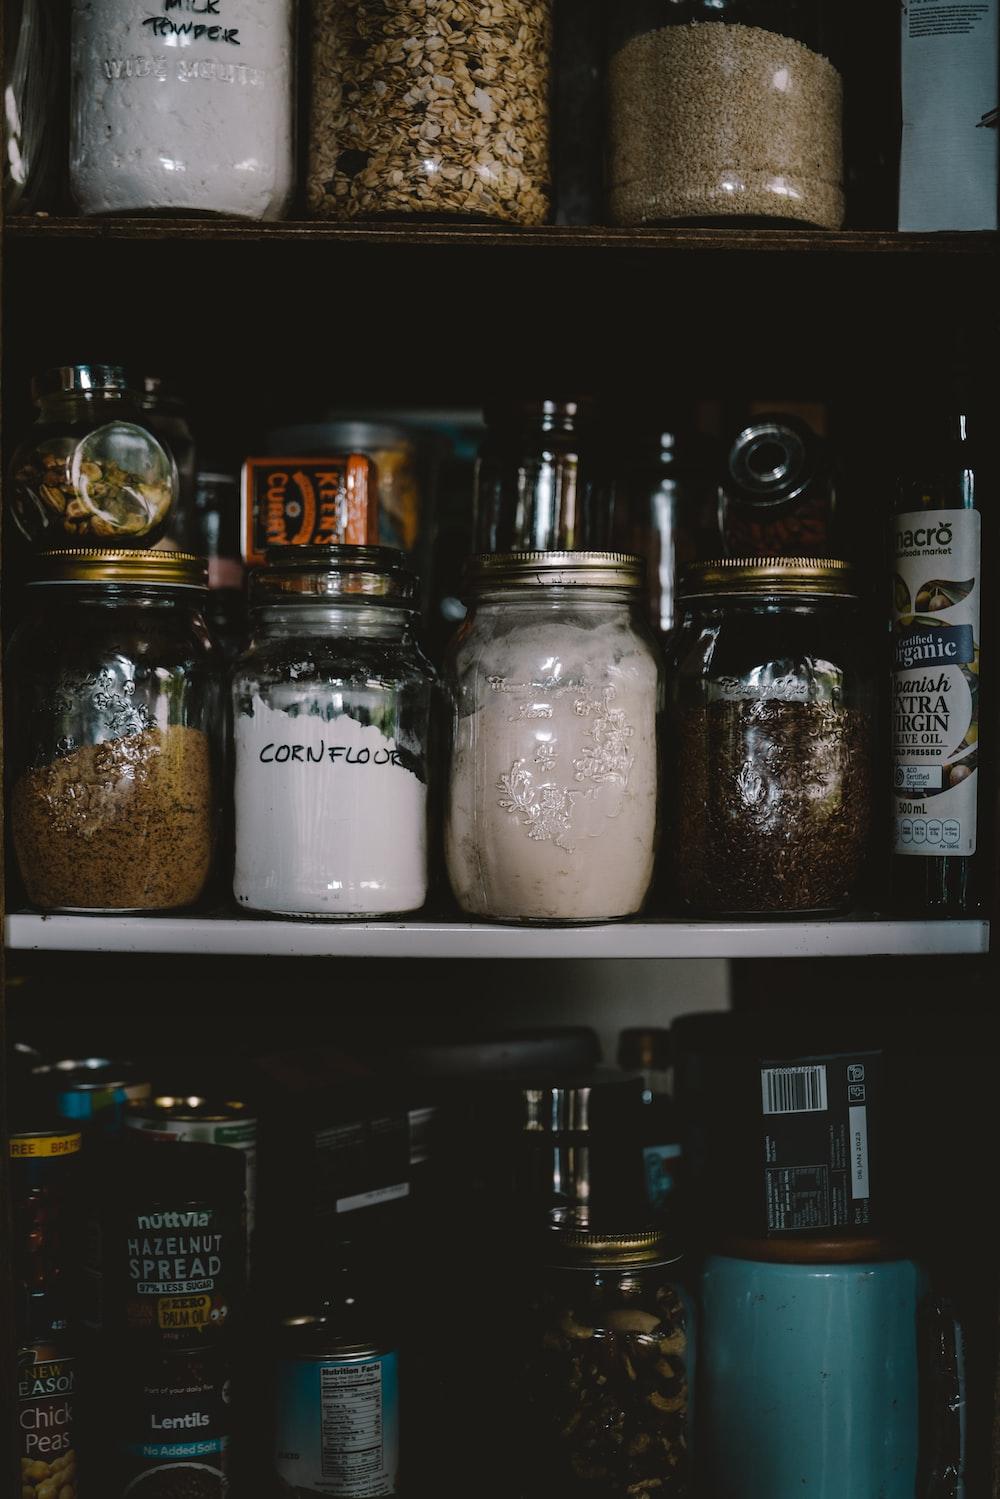 two clear glass jars on white shelf